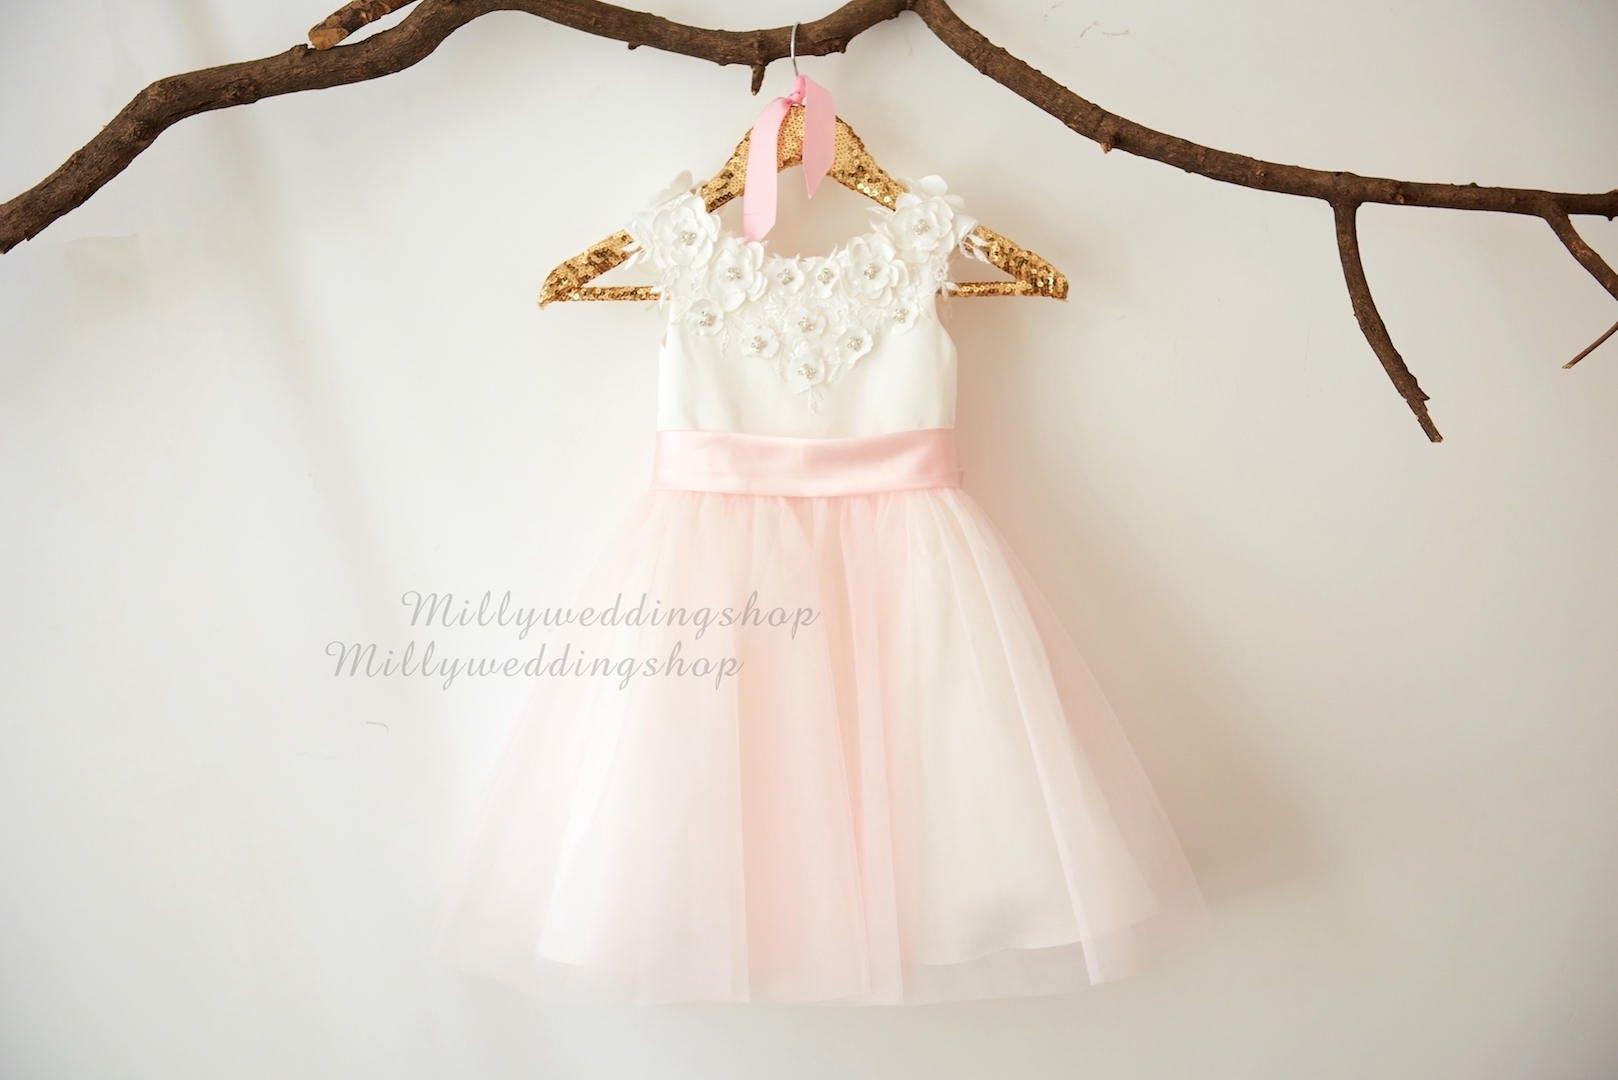 Light Gray Bridesmaid Dresses Knee Length Soft Tulle: Ivory Satin Beaded Lace Light Pink Tulle Flower Girl Dress